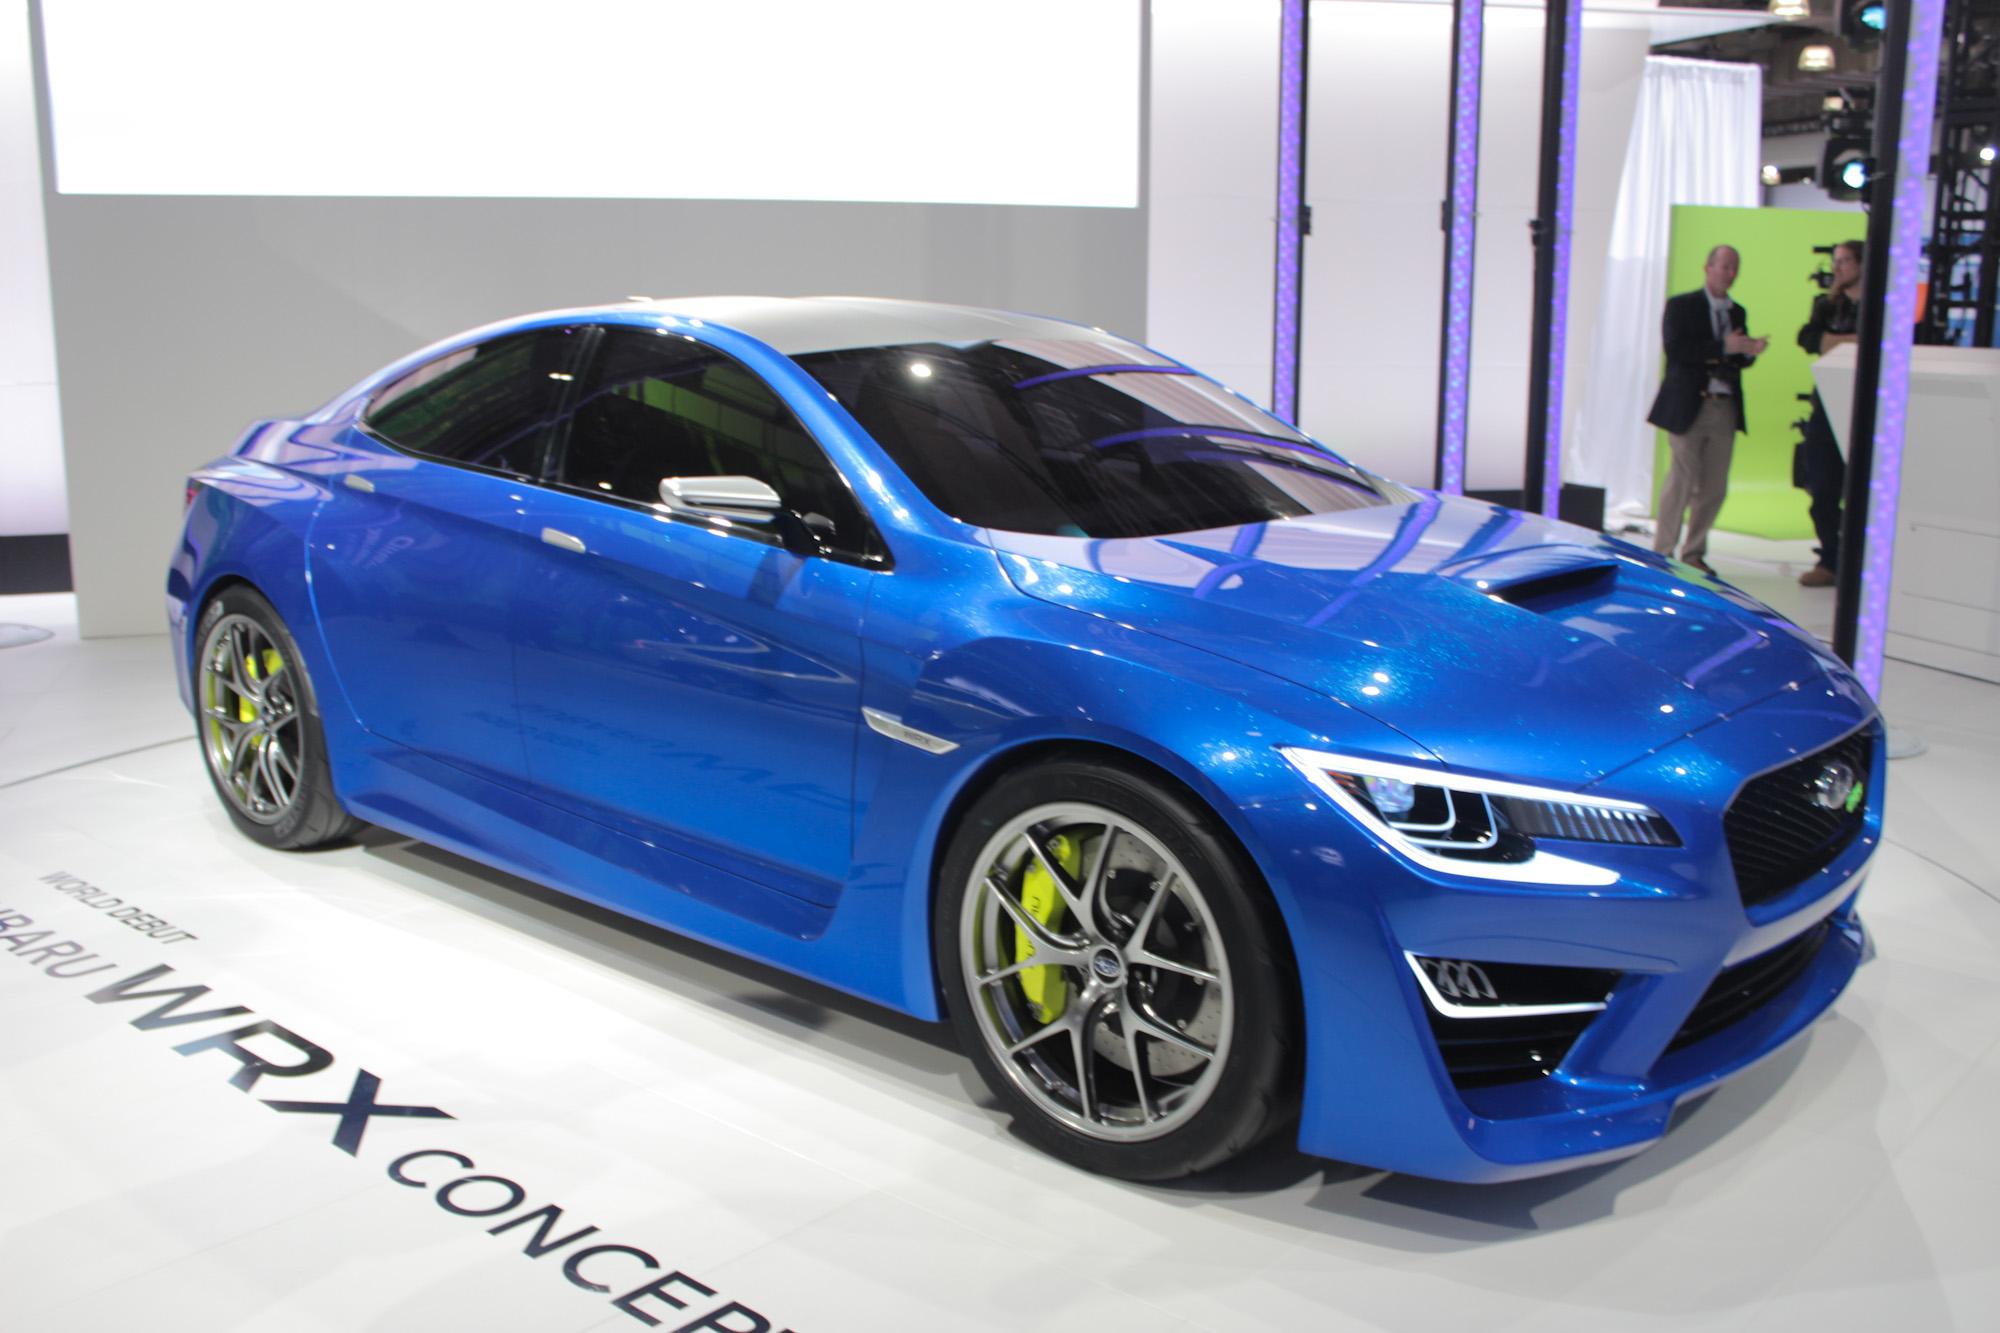 Subaru Wrx Concept New York Auto Show H on Acura Integra Hatchback